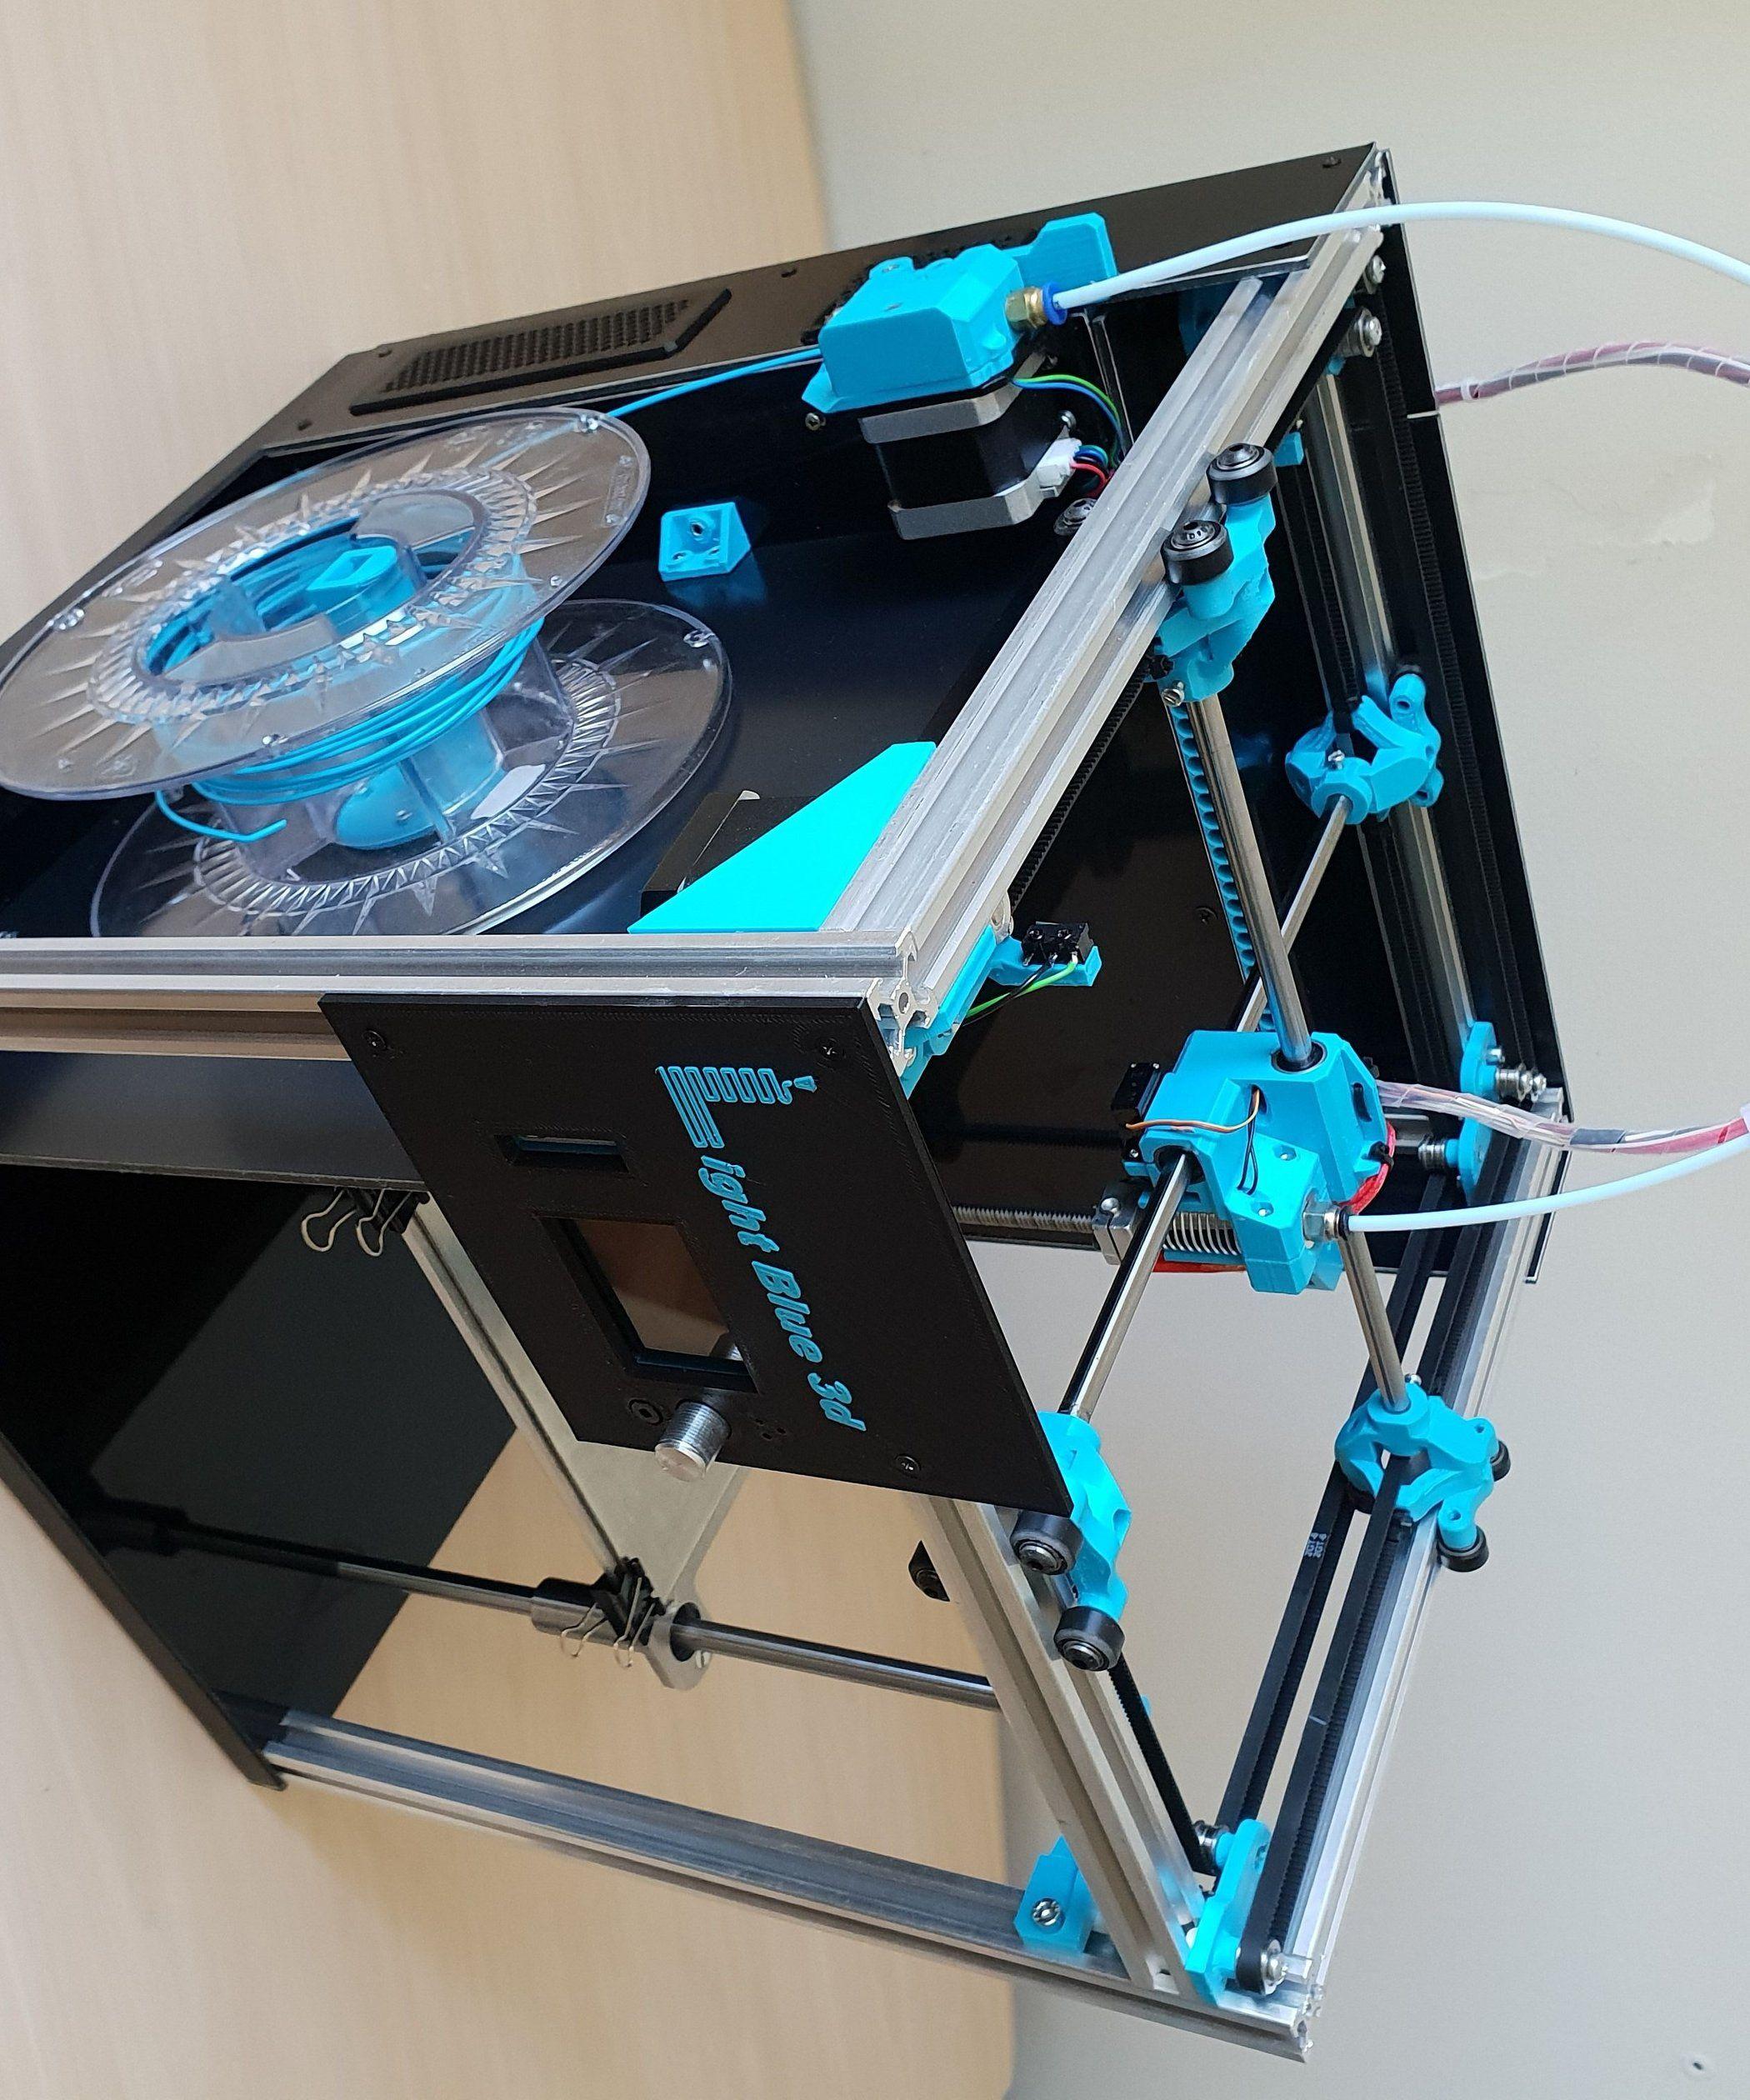 LightBlue 3D | Electronic project ideas | 3d printer